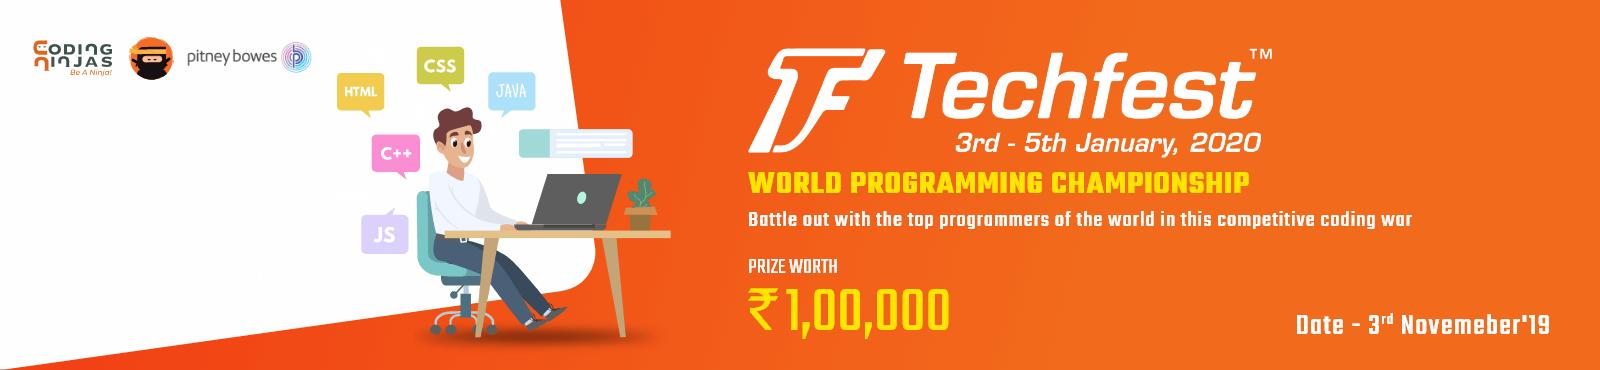 World Programming Championship